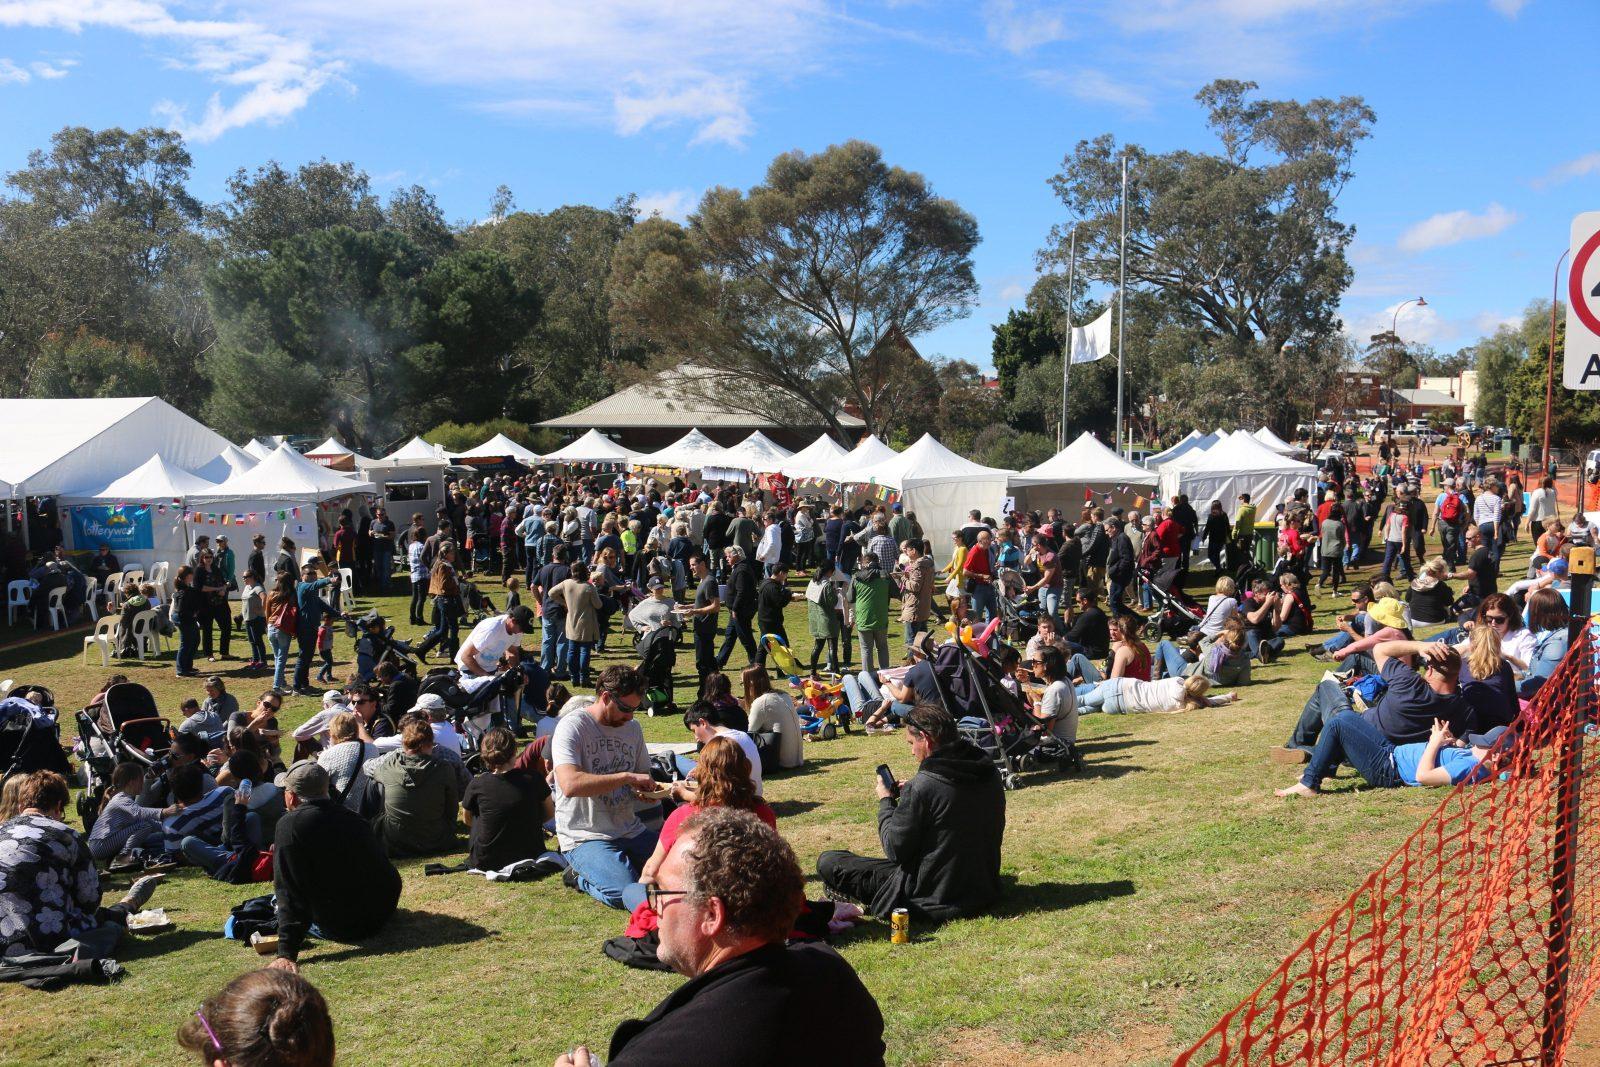 Toodyay International Food Festival, Toodyay, Western Australia